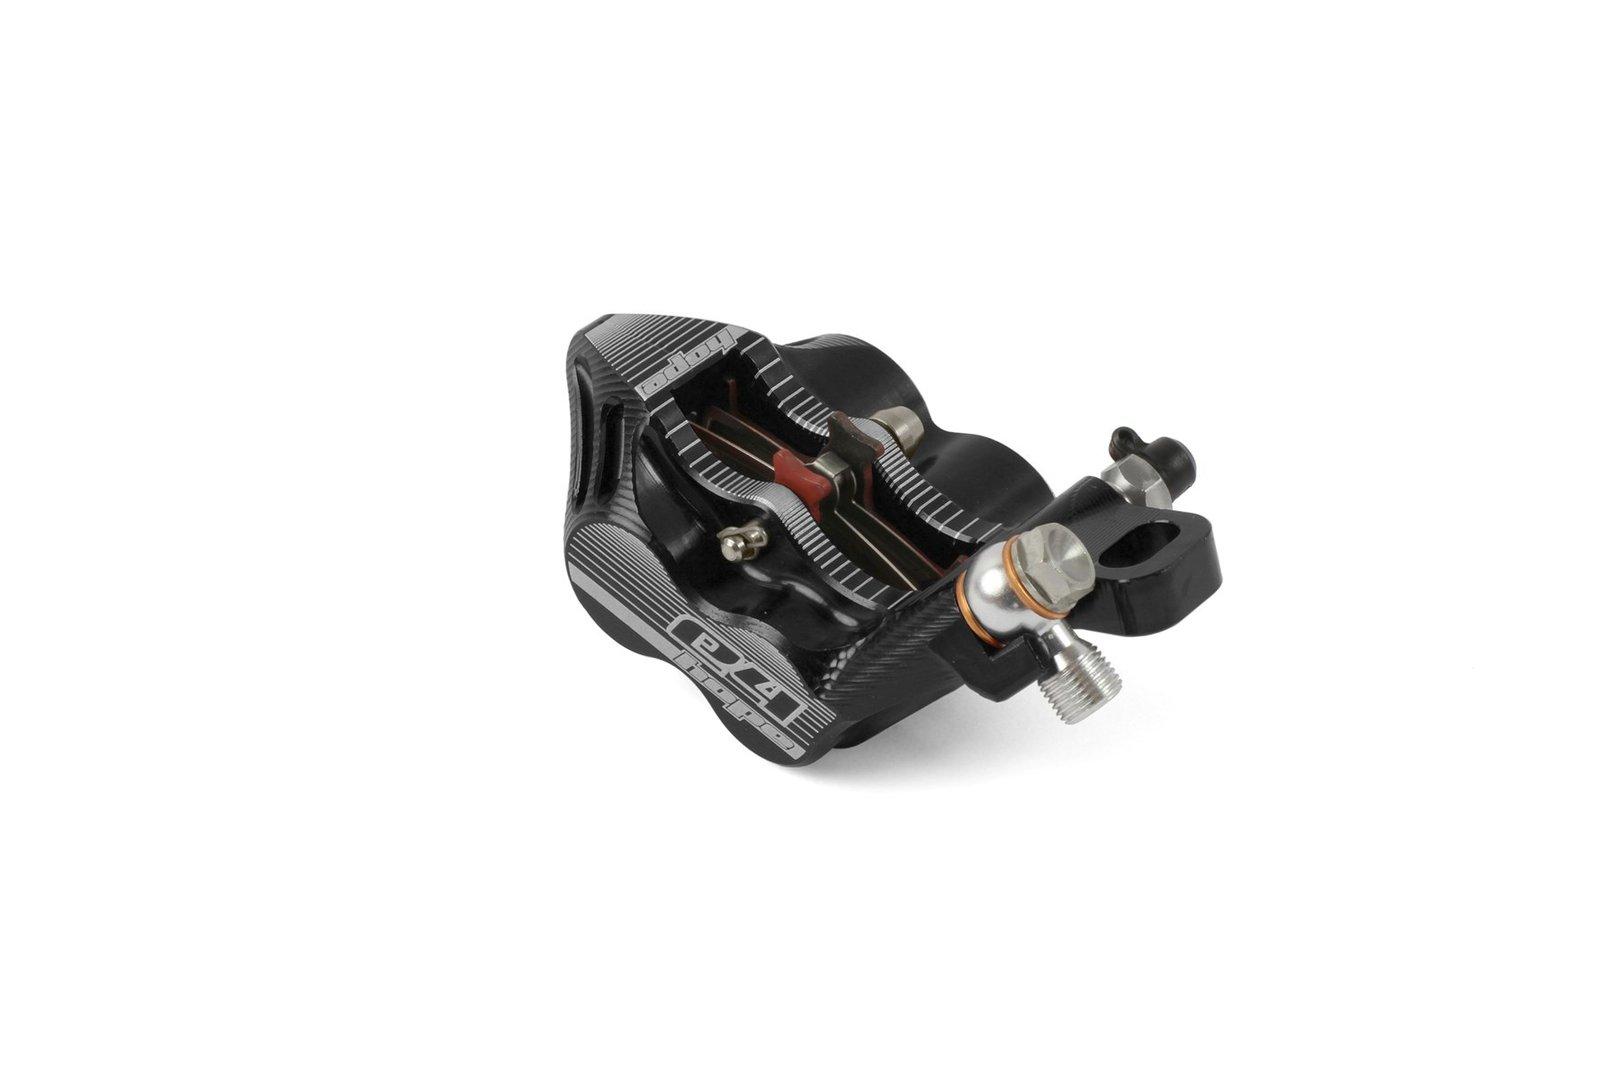 Details about  /Caliper Alignment Tool For Hope E4 V4 Brake Calipers